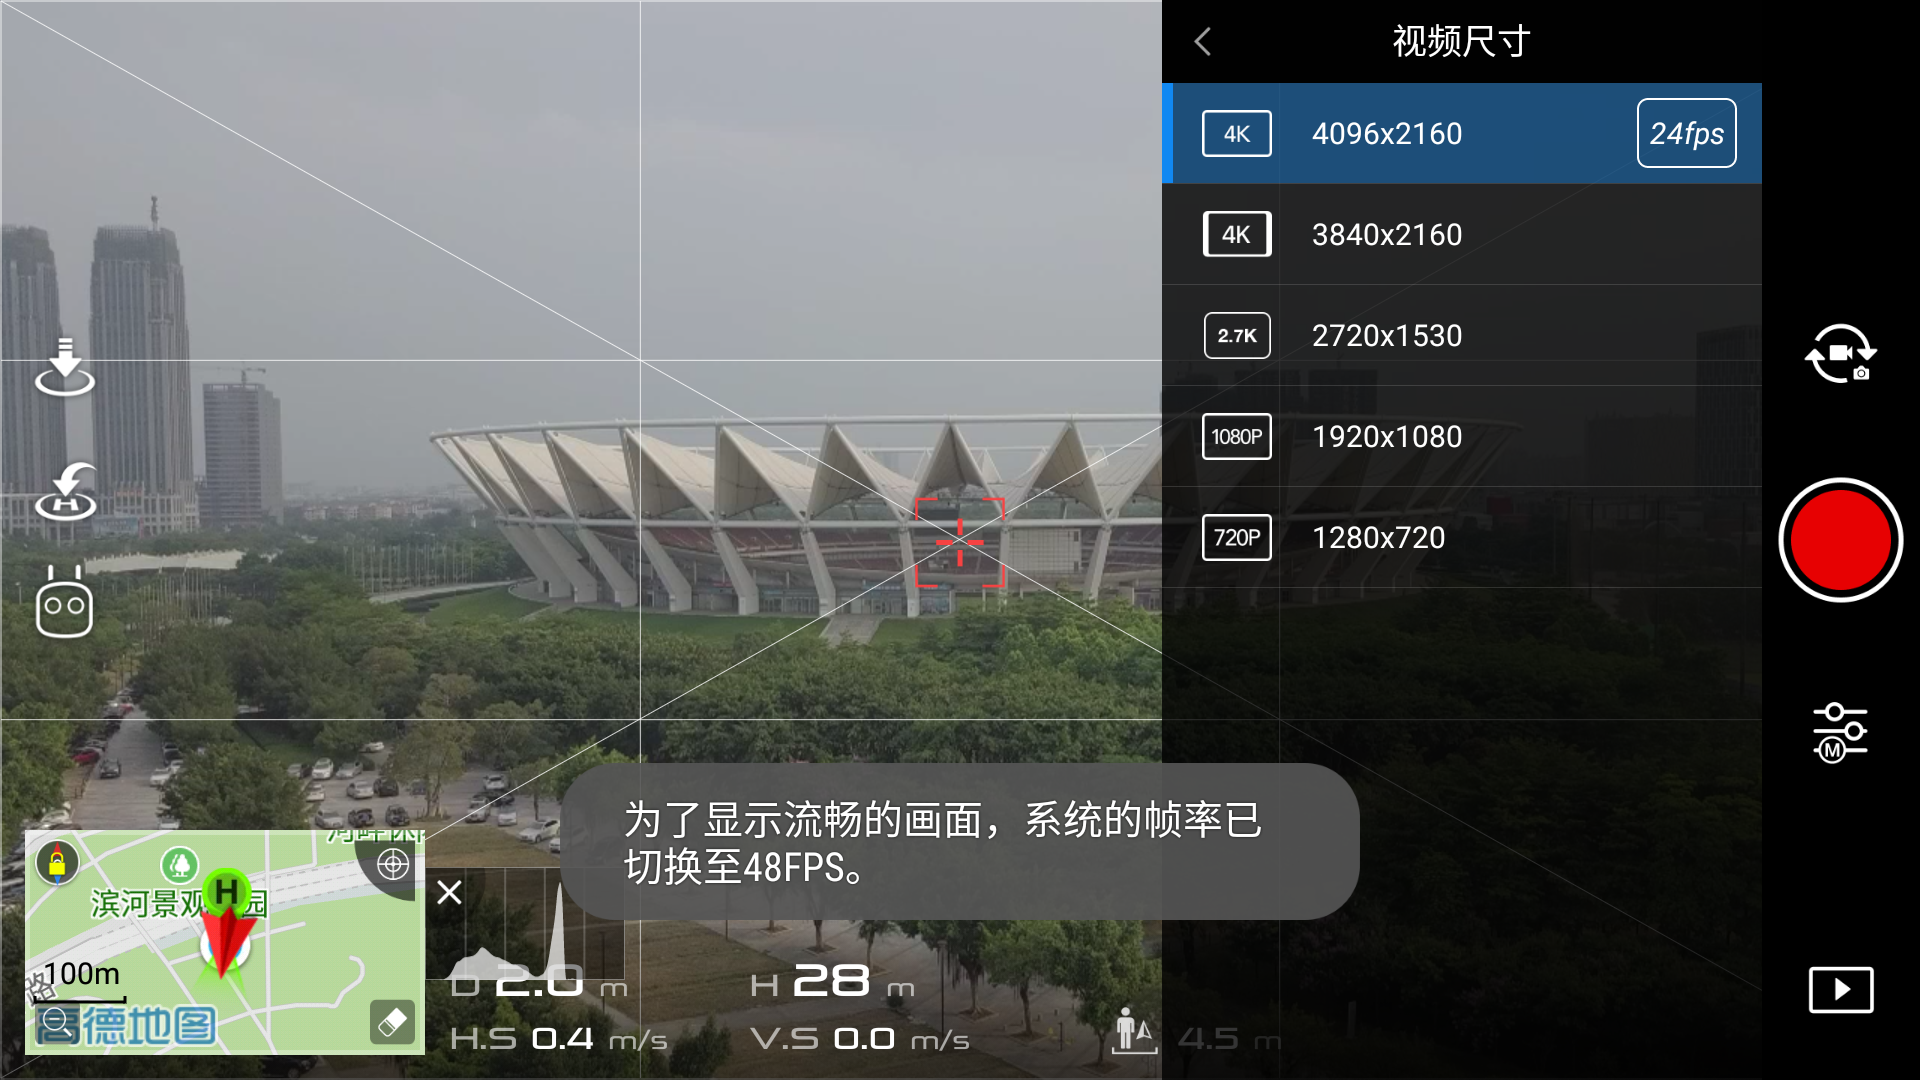 Screenshot_2018-05-28-16-56-02.png